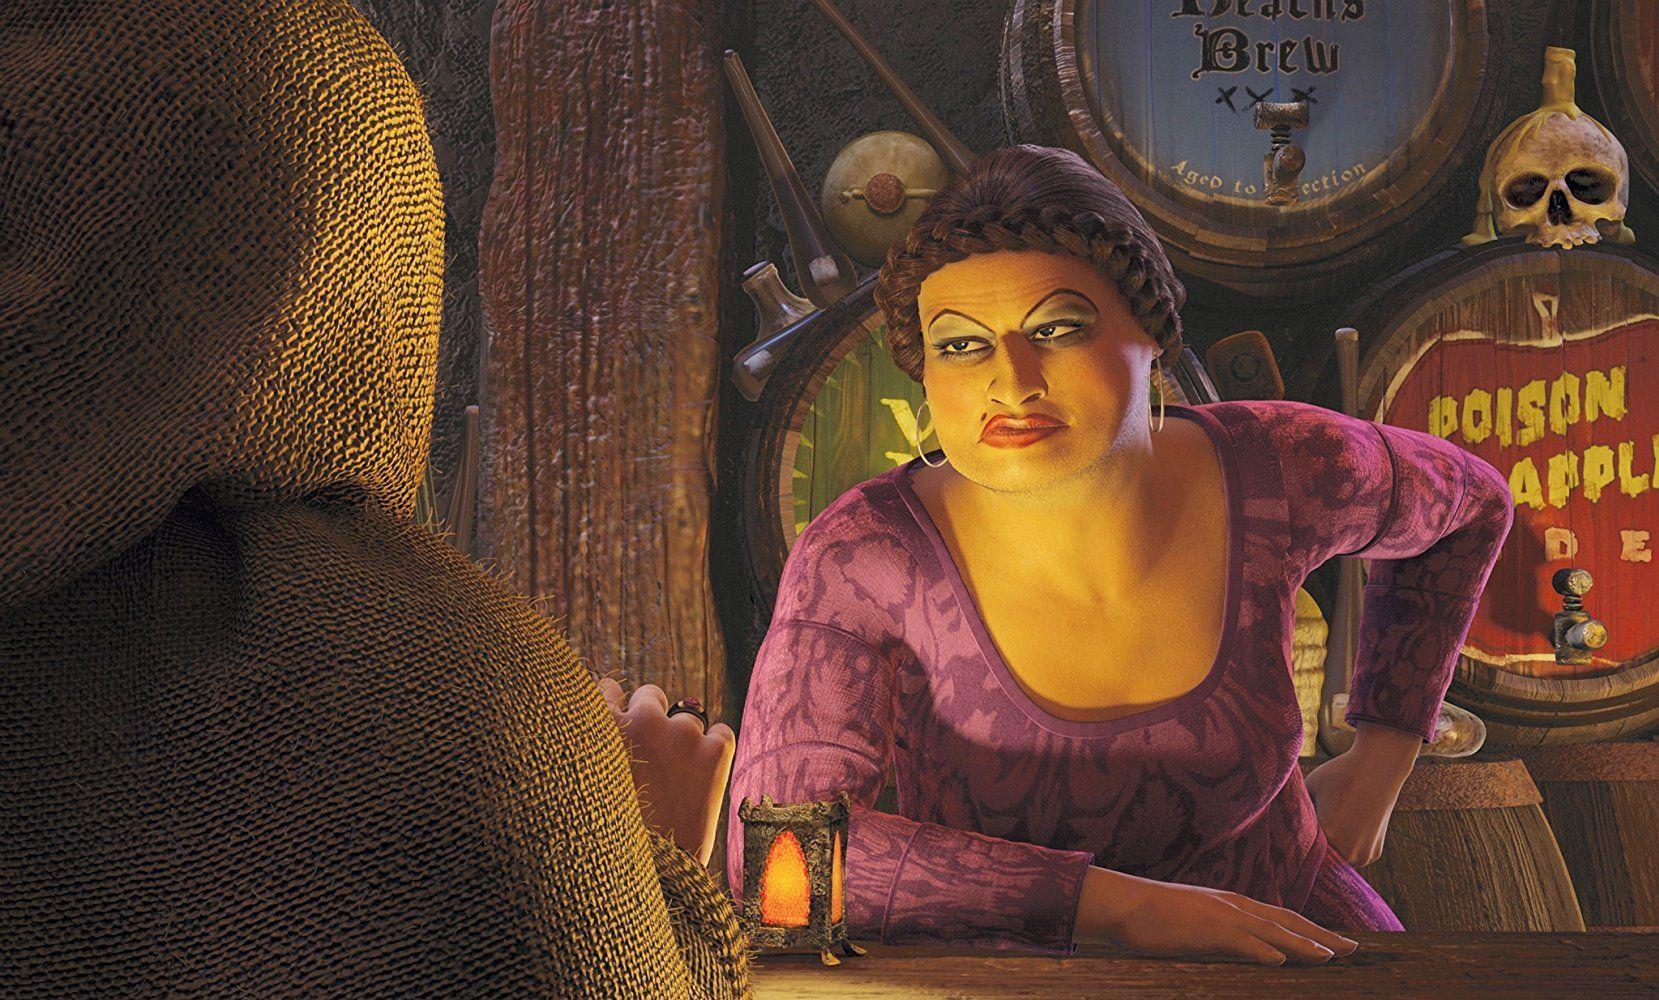 Pin On Shrek 2001 2004 2007 2010 2011